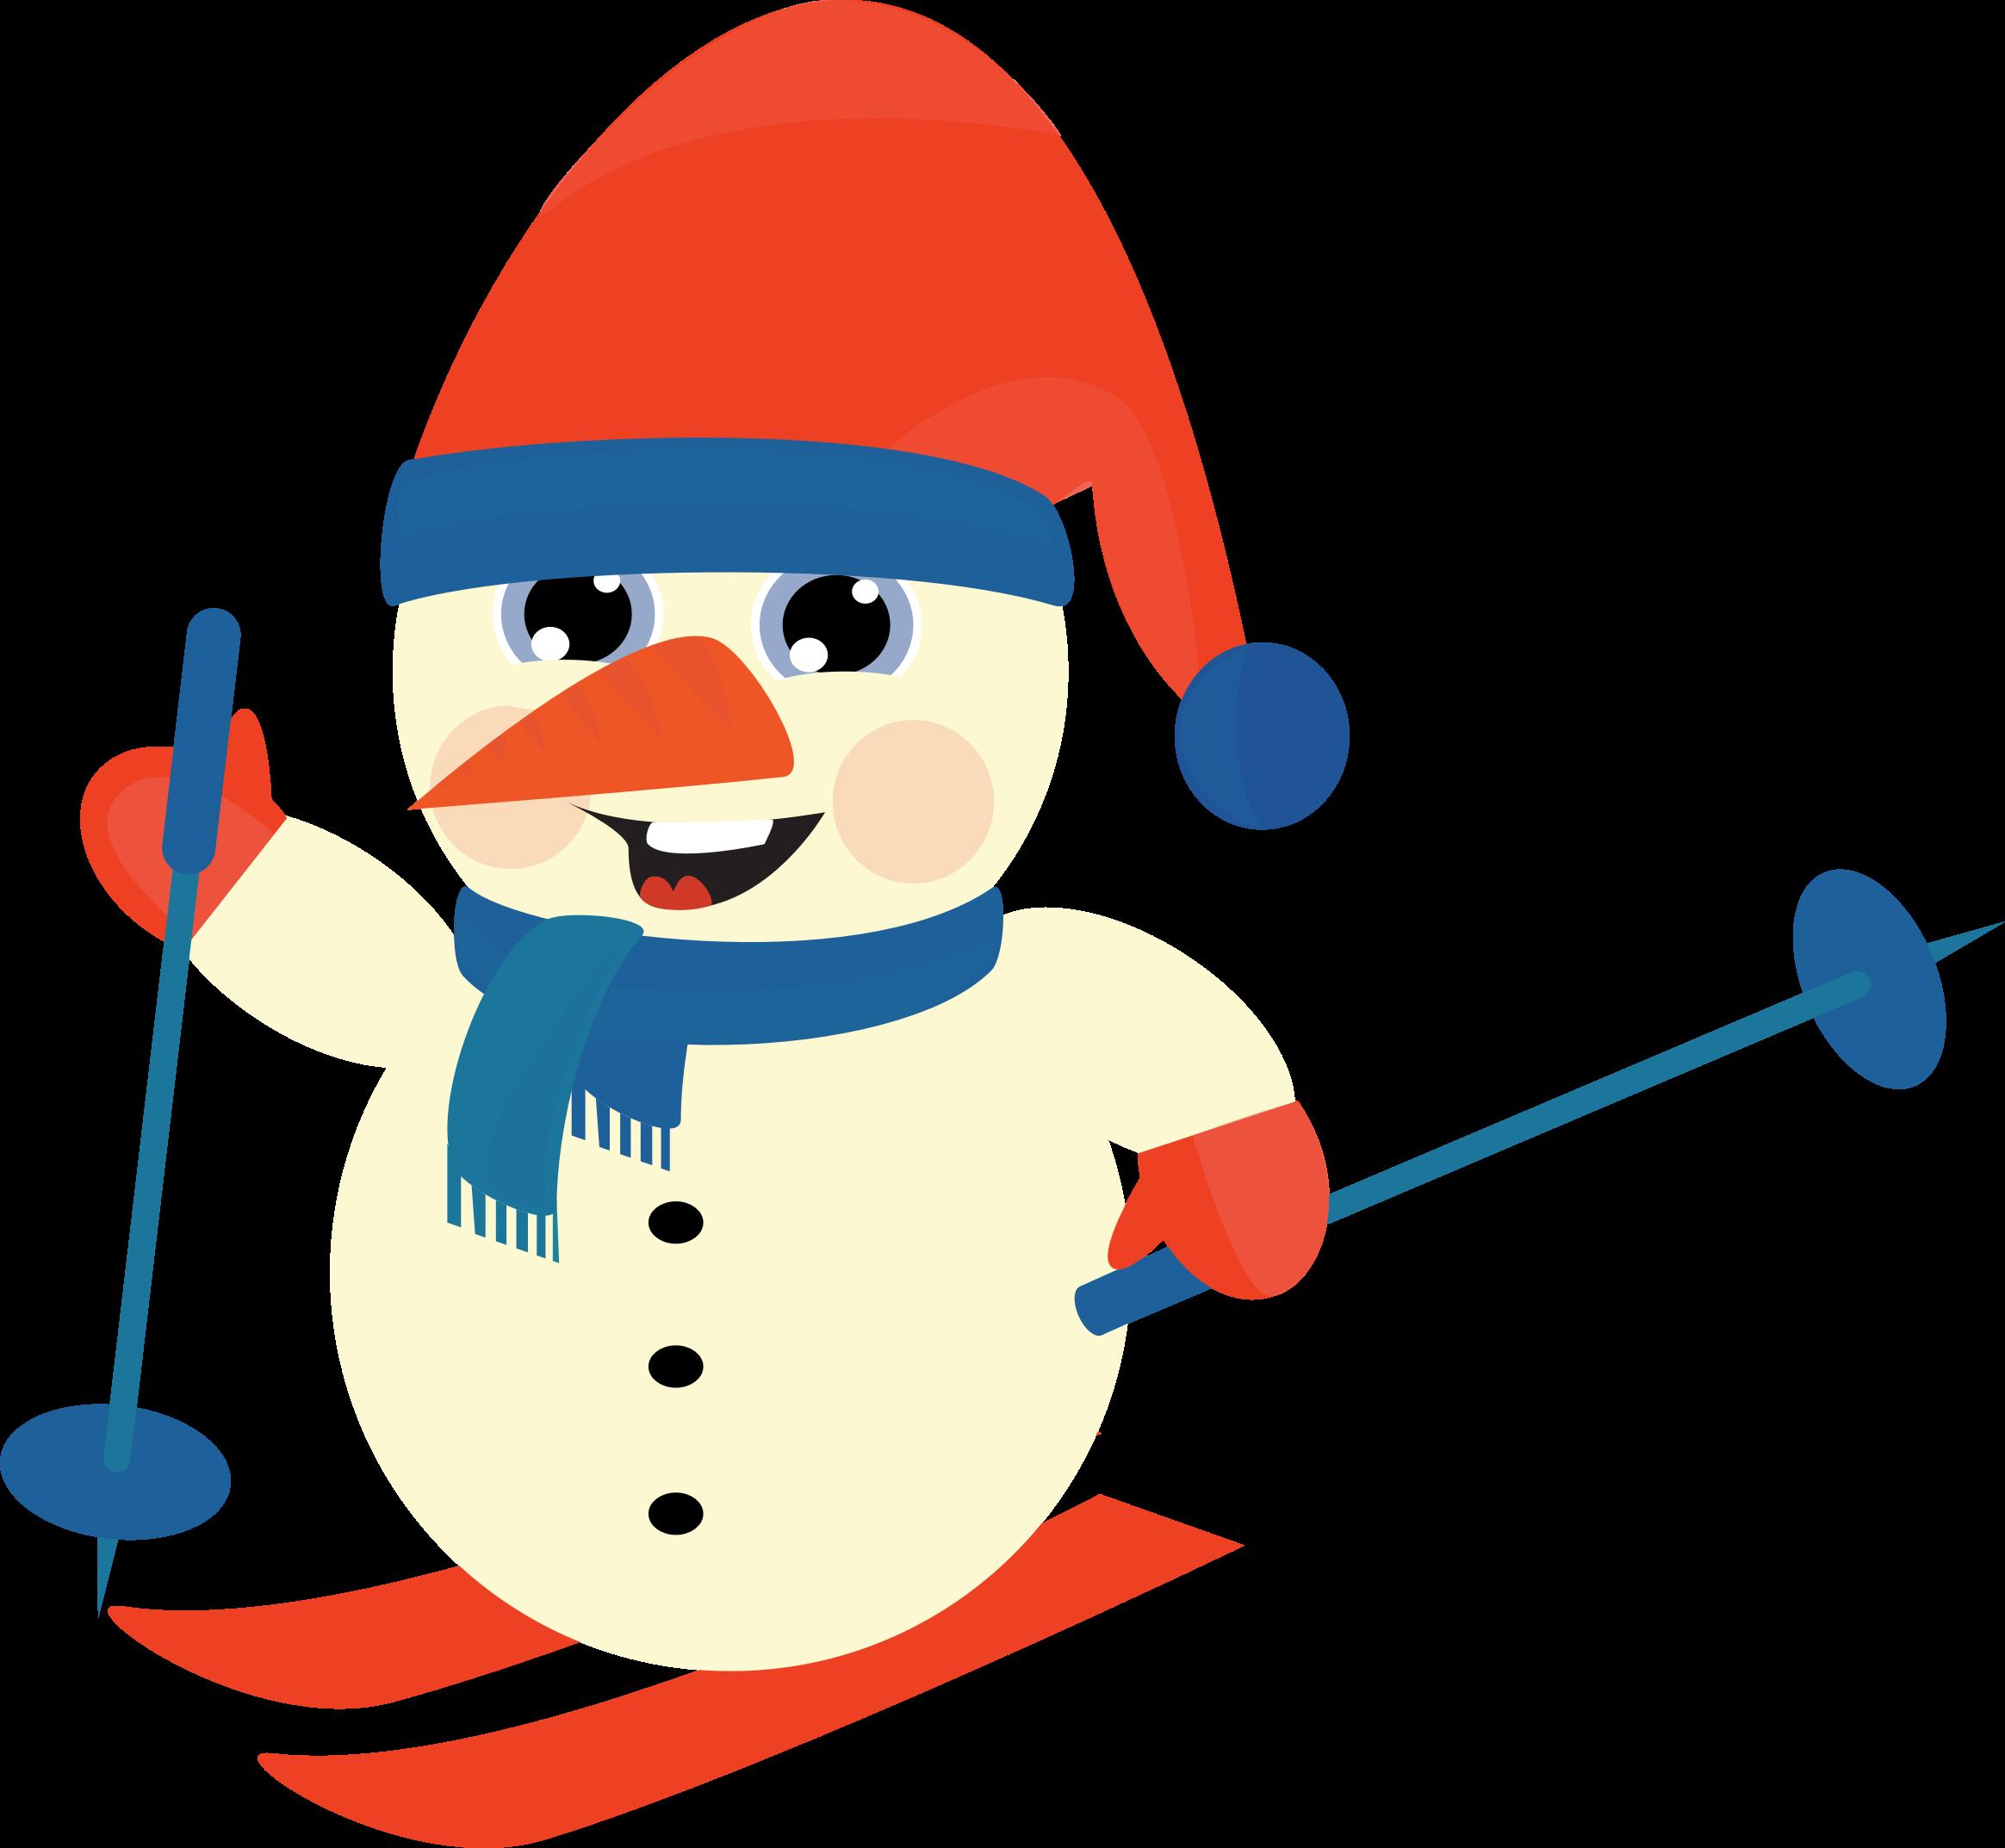 Snowman clipart skiing Skiing Skiing Snow Snow Man